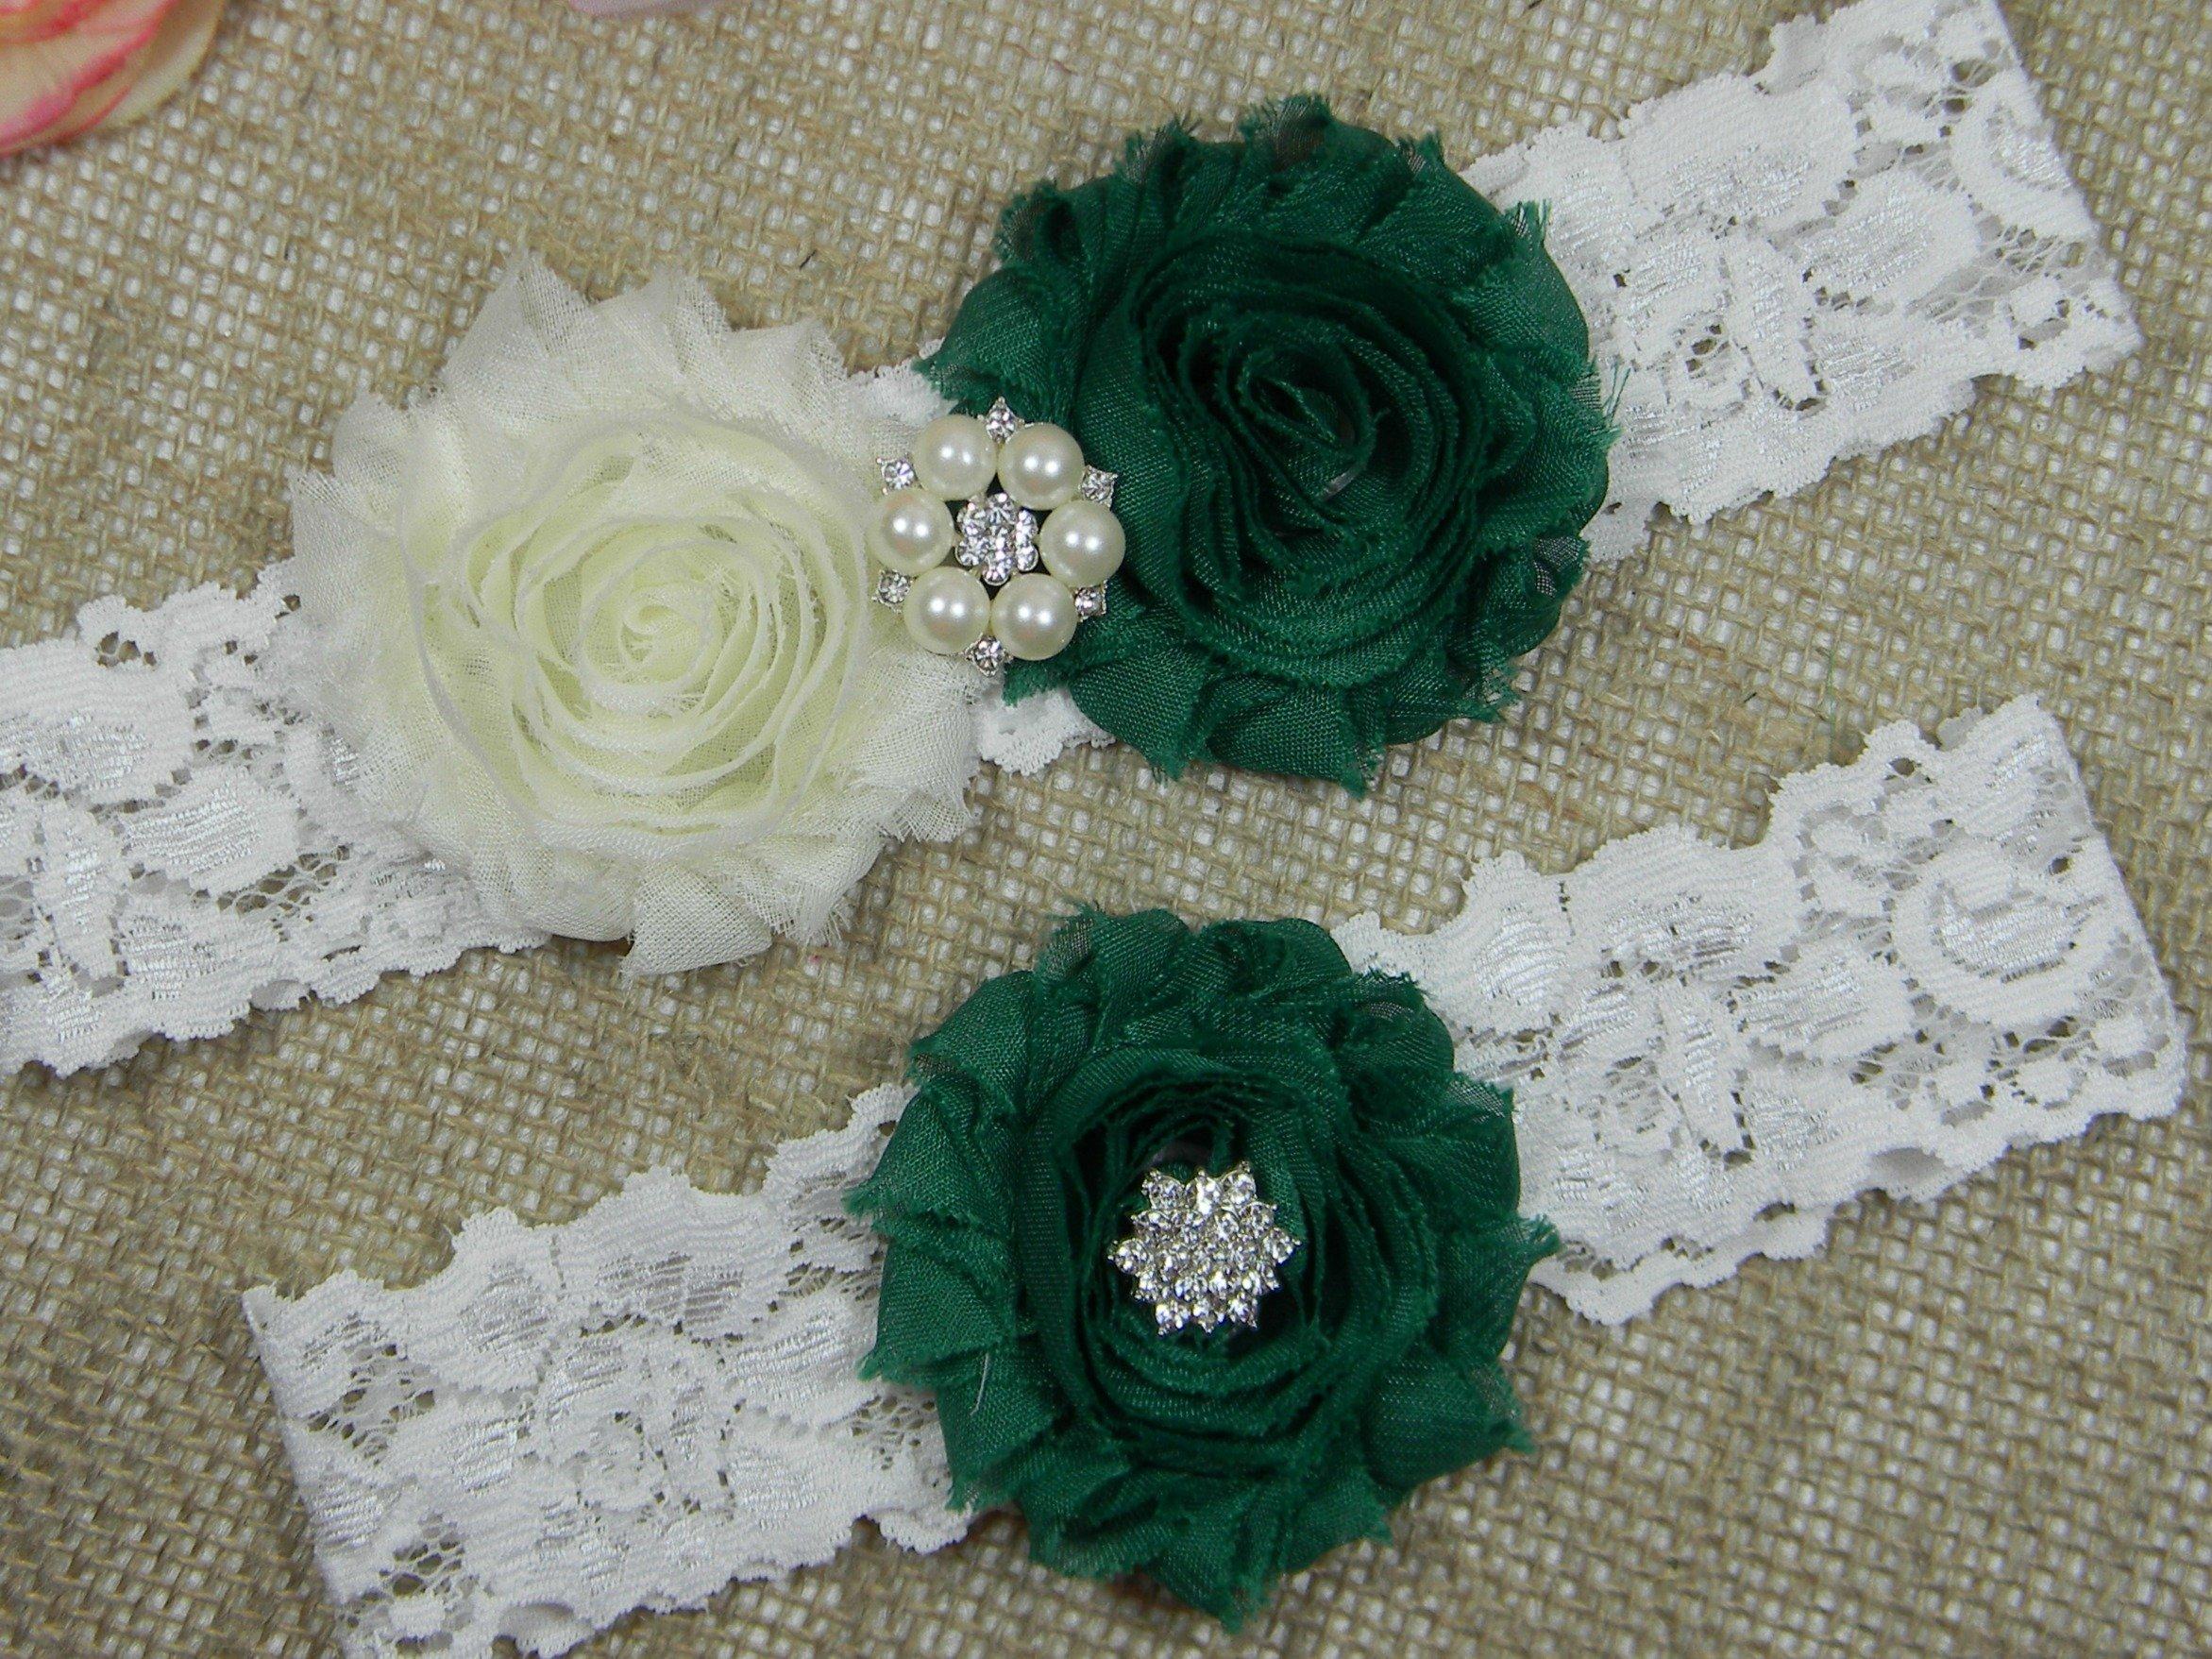 Wedding Garter Set, Bridal Garter Belt, Ivory and Dark Green Garter, Keepsake and Toss Stretch Lace Garters by PCB Studio